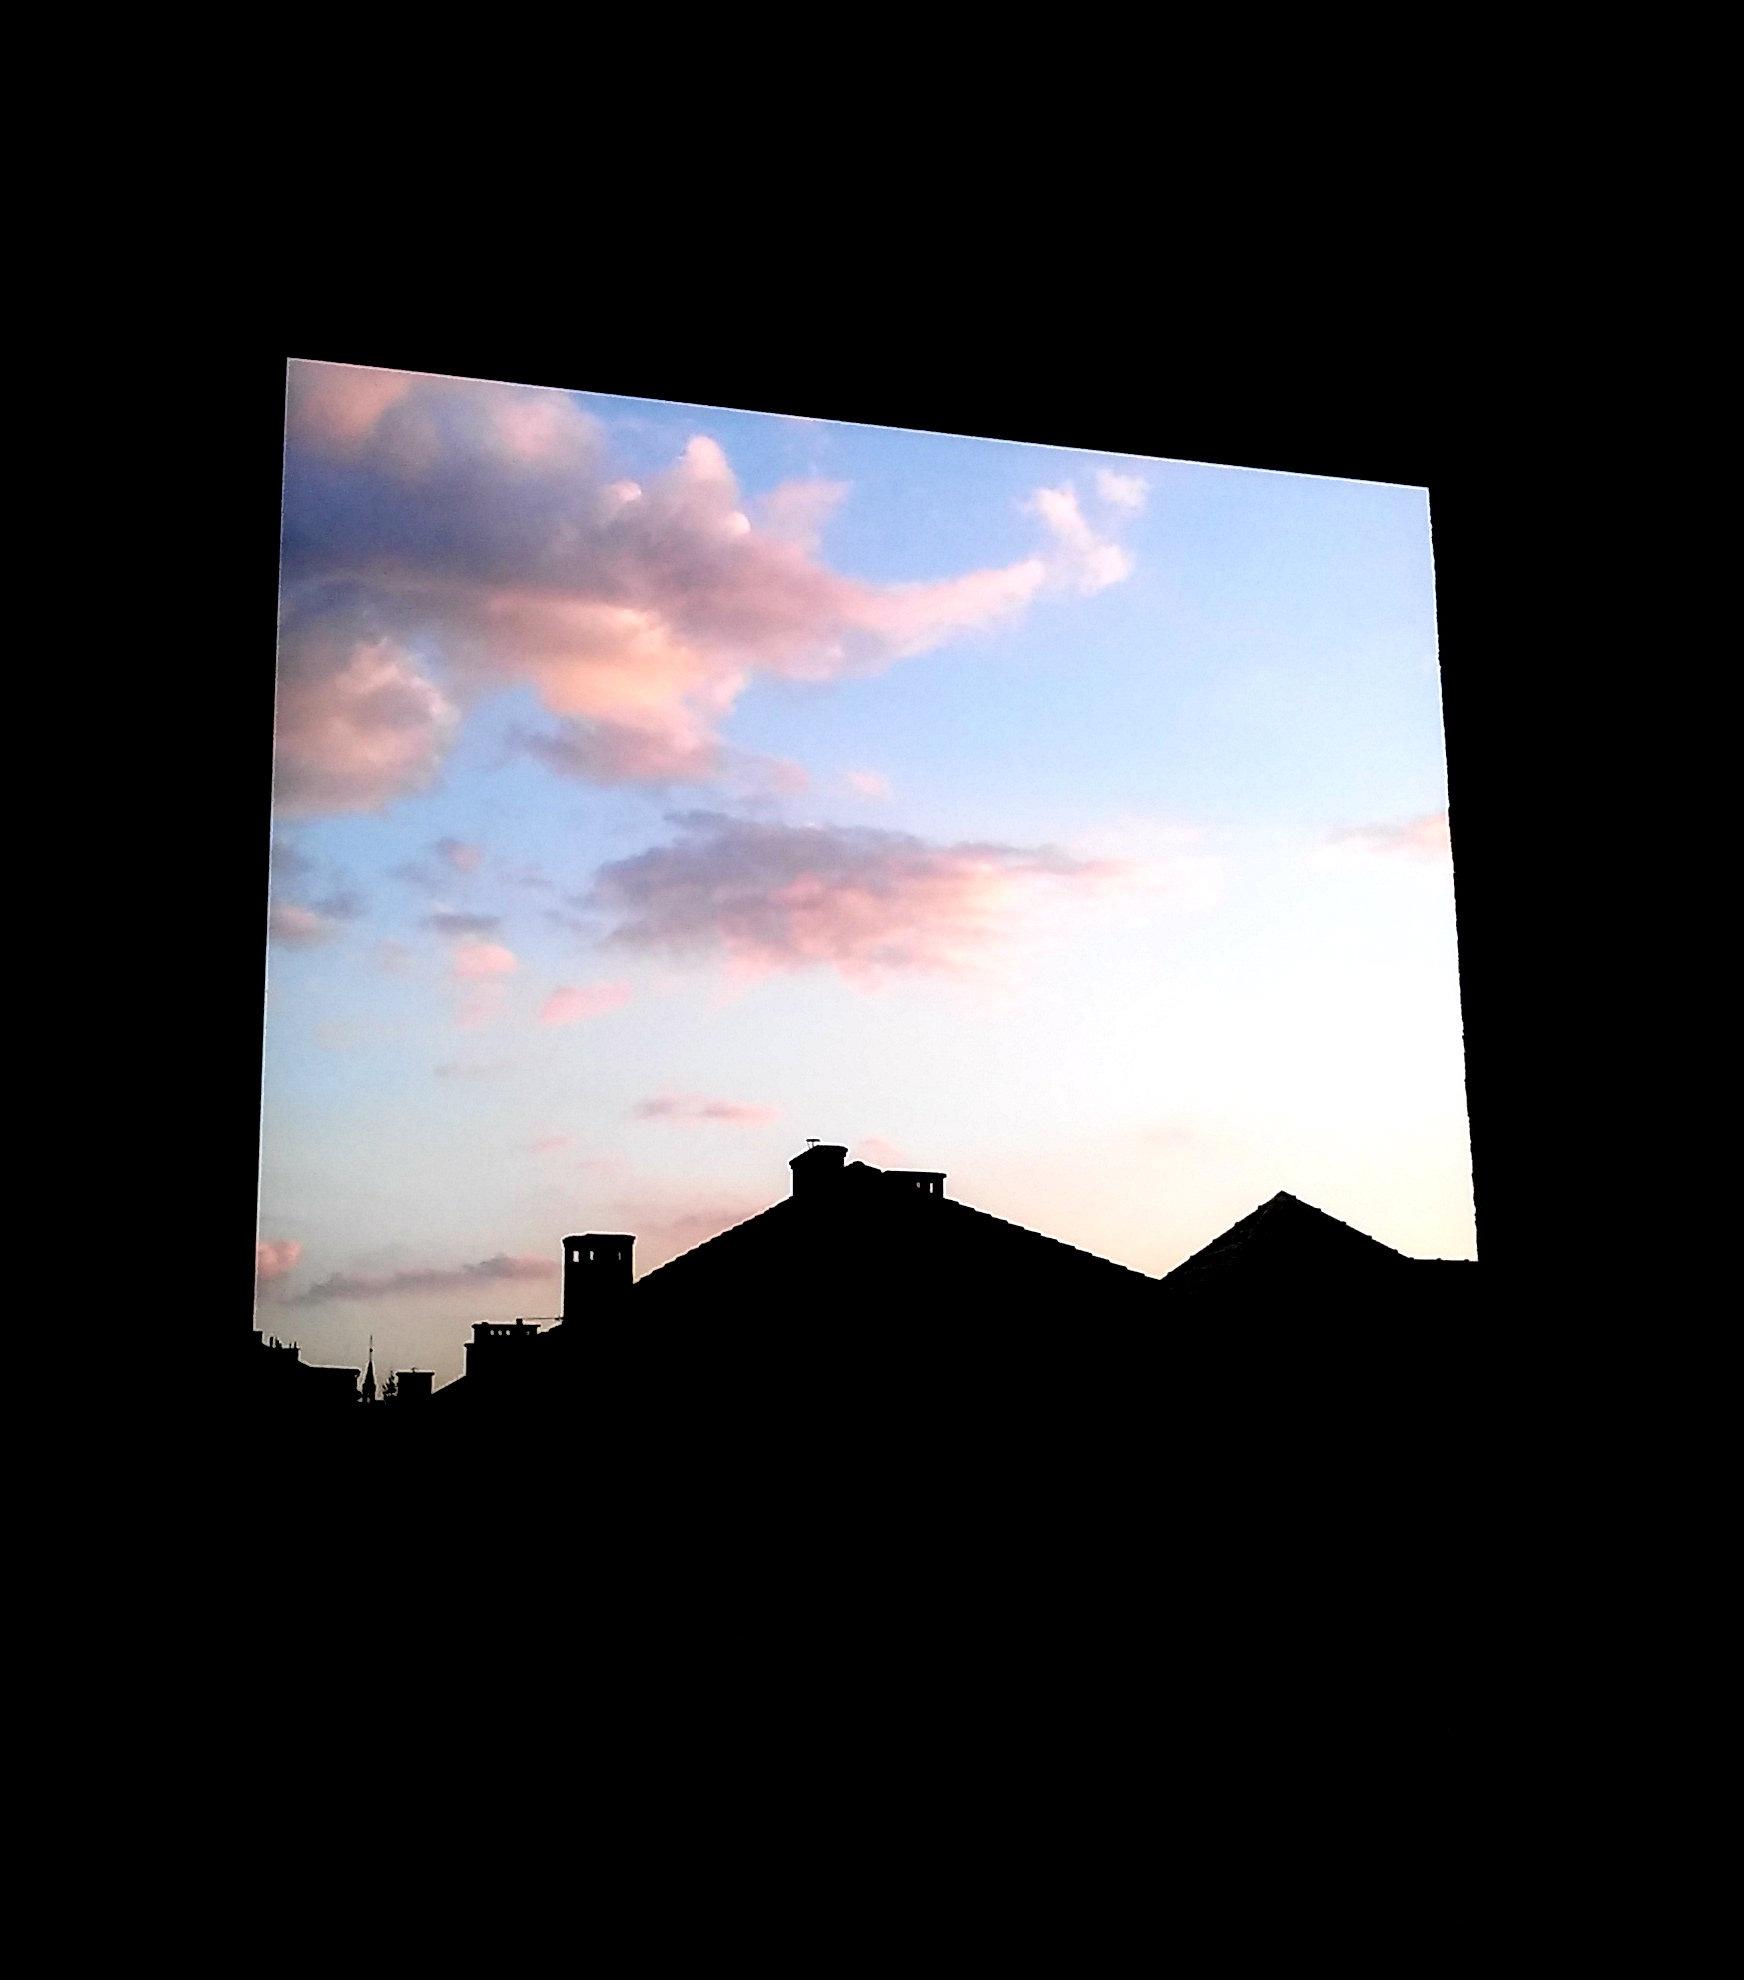 Sunset by ogiegloart